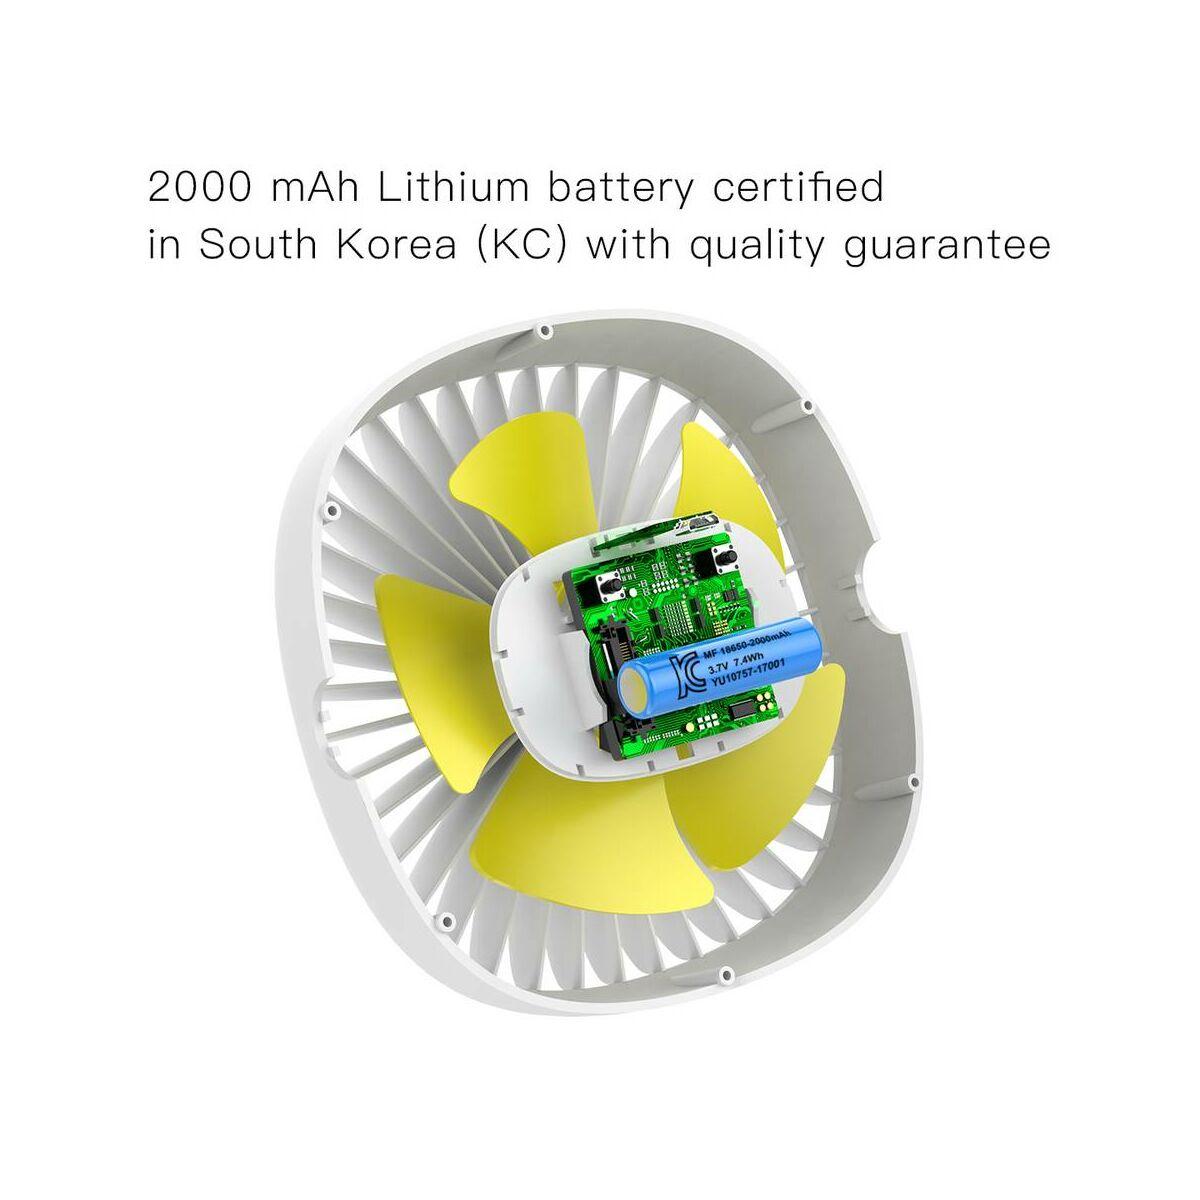 Baseus ventilátor, otthoni, Box Clamping, 2000 mAh, 3.5W, fehér (CXFHD-02)